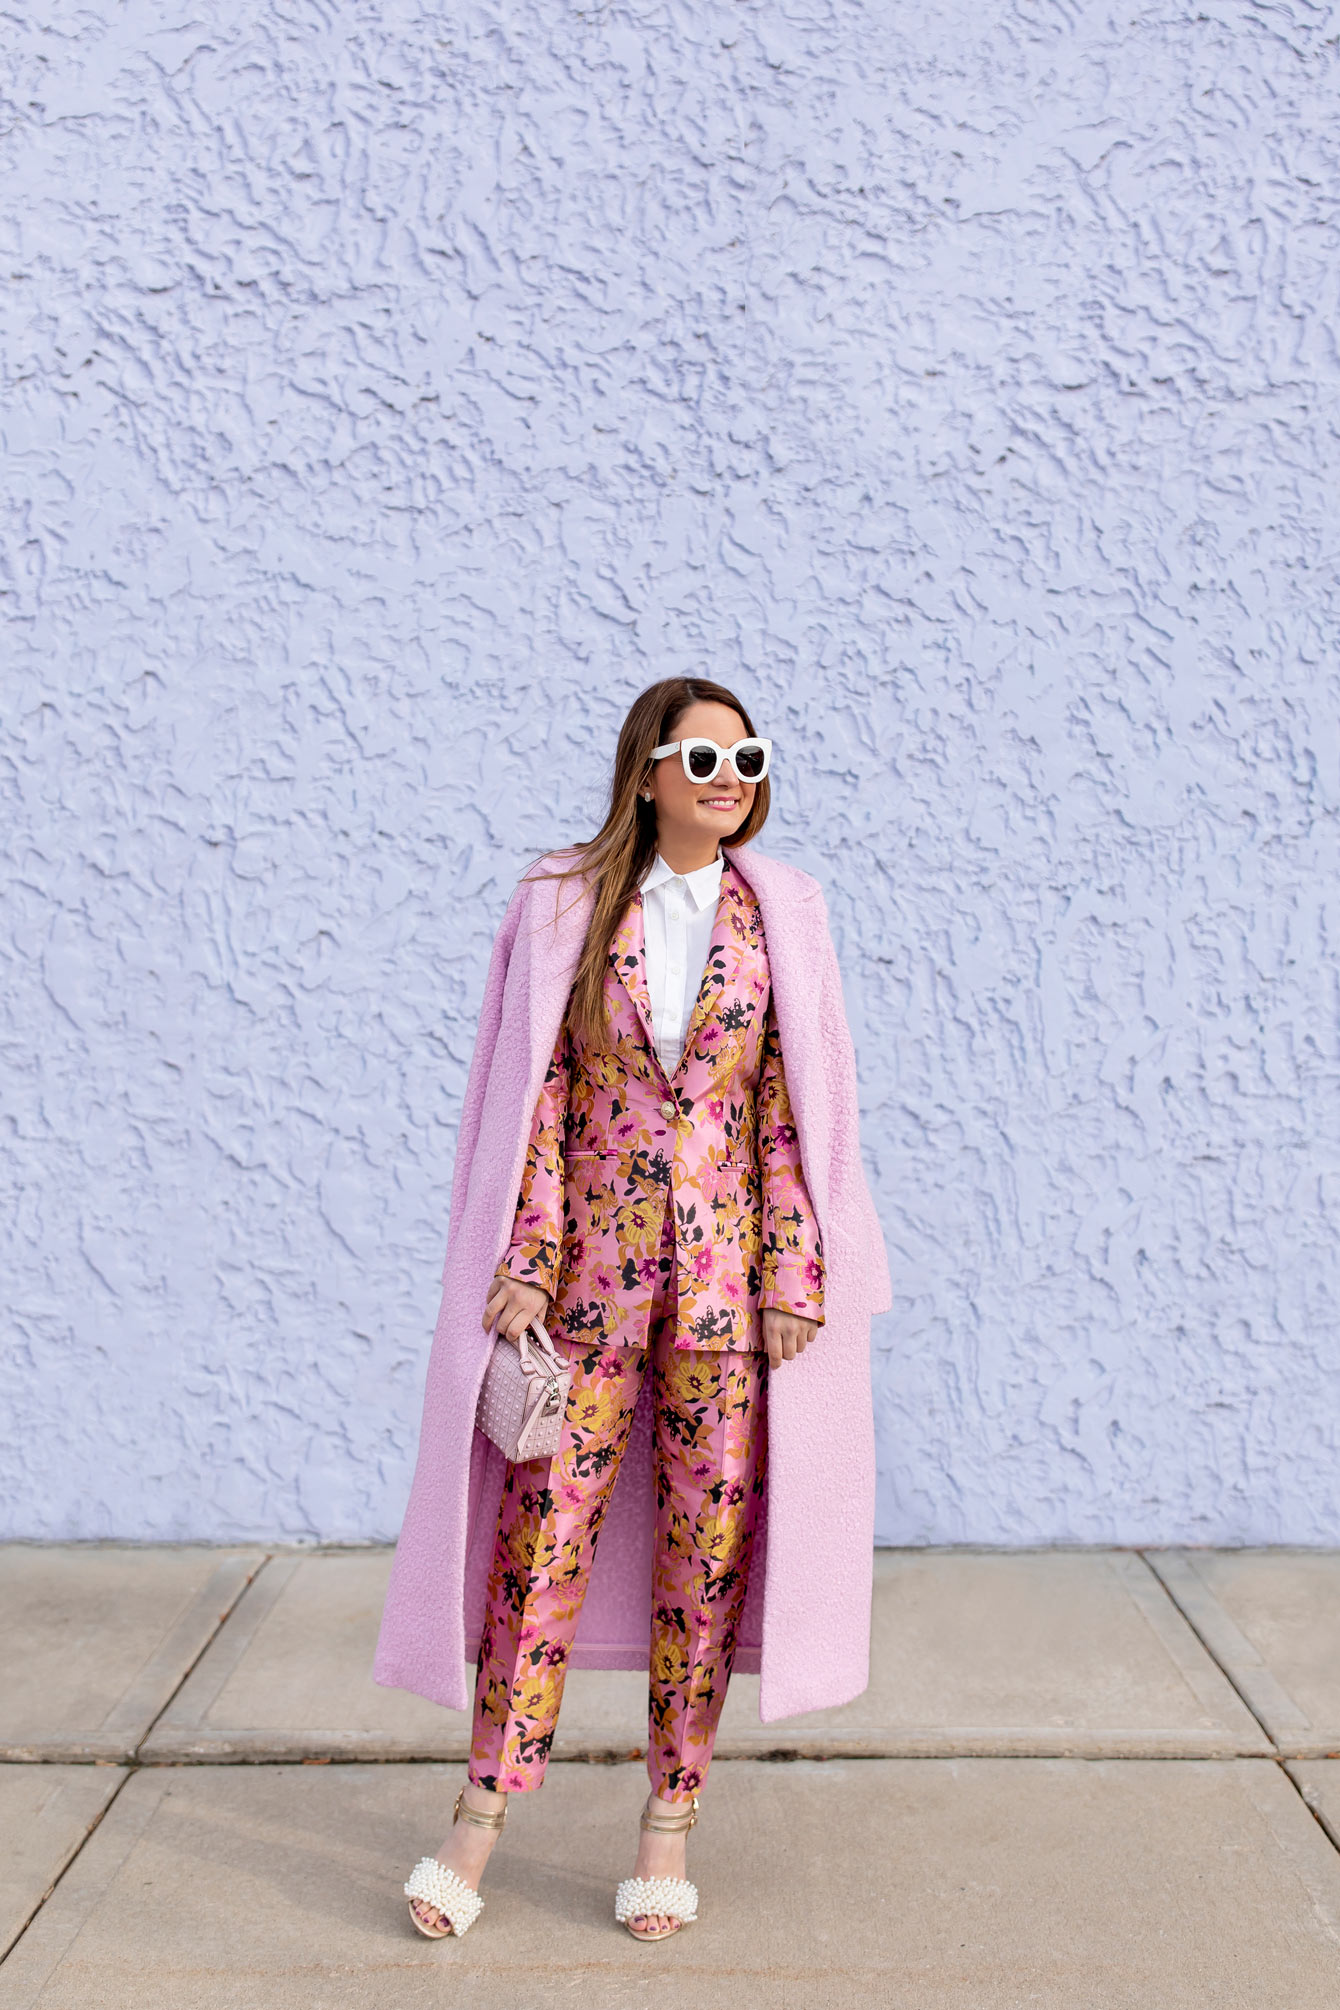 River Island Pink Textured Coat